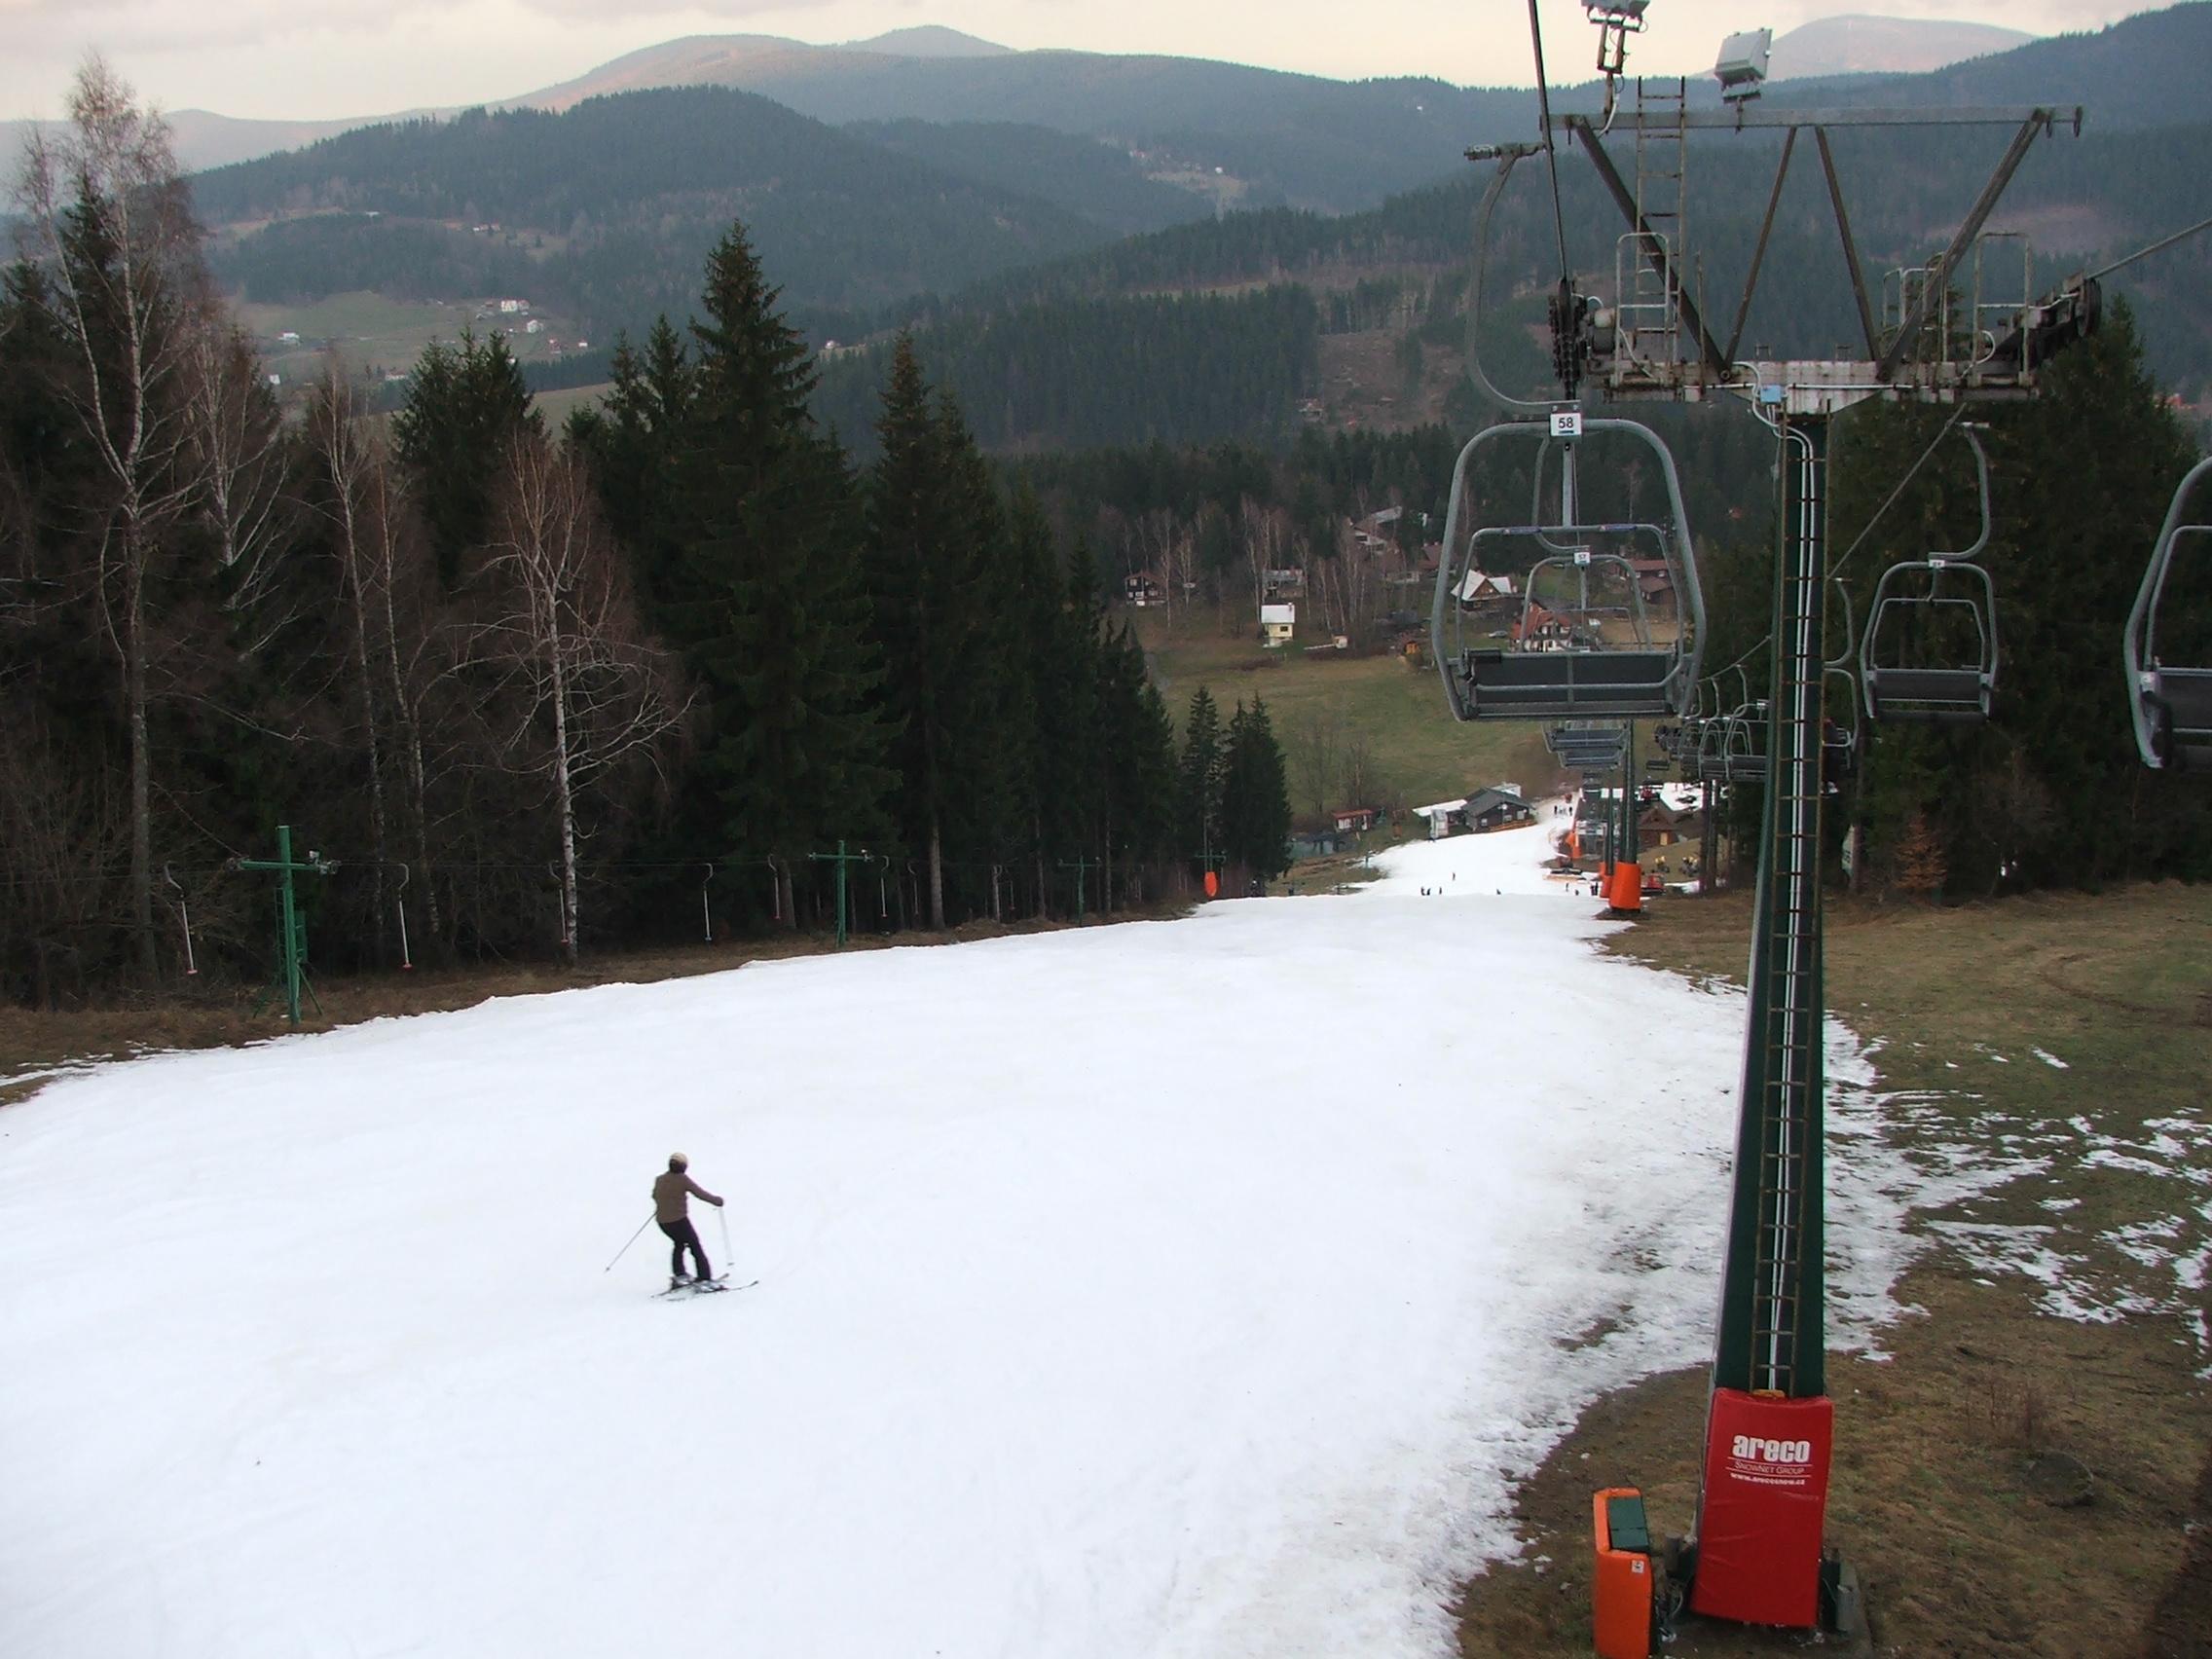 28.12.2013-Ski areál RALIŠKA,aktuální stav (17)